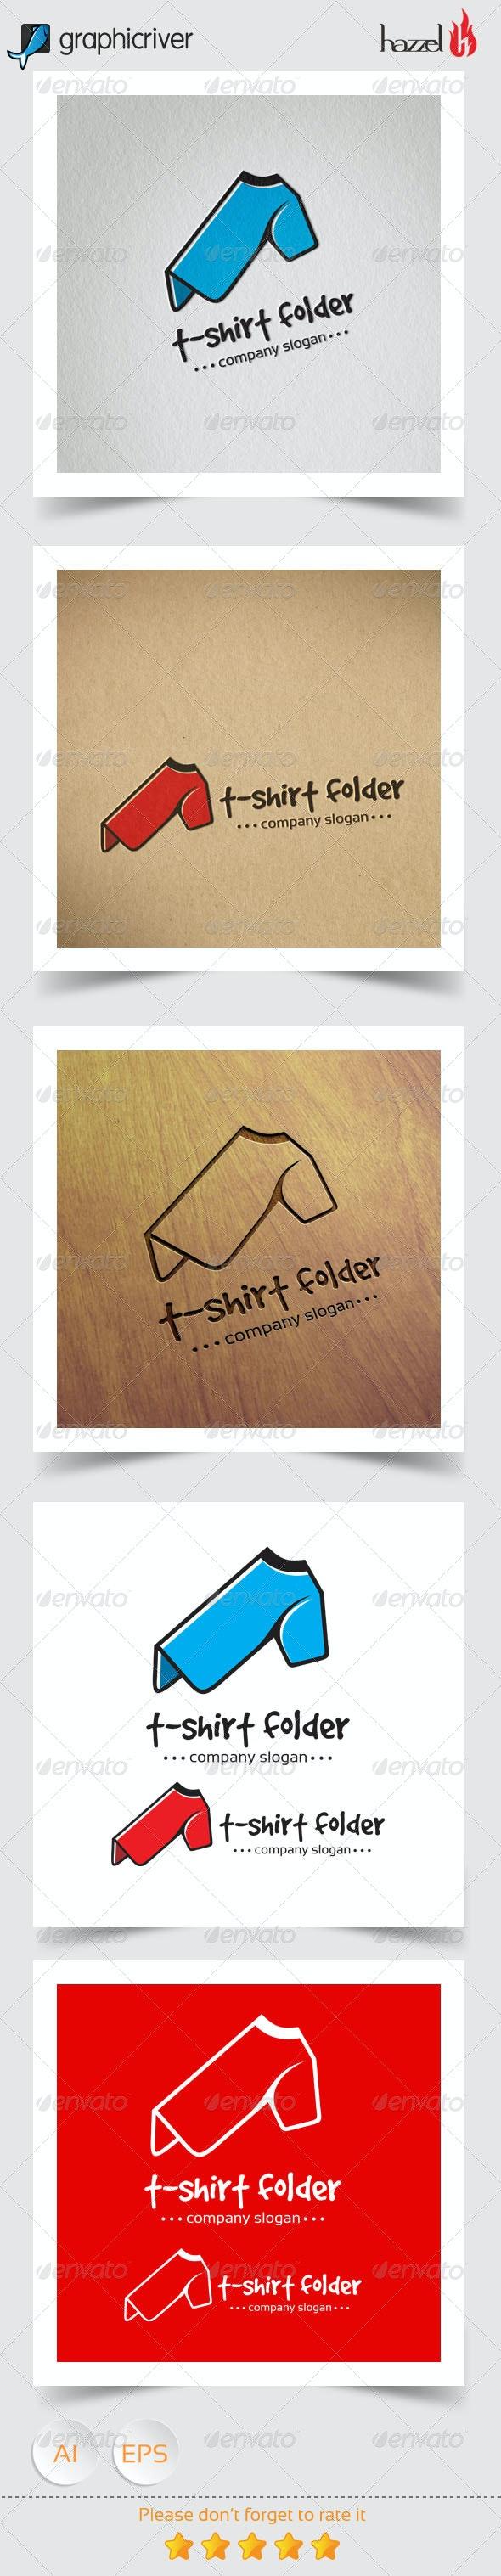 T-shirt Folder Logo - Vector Abstract